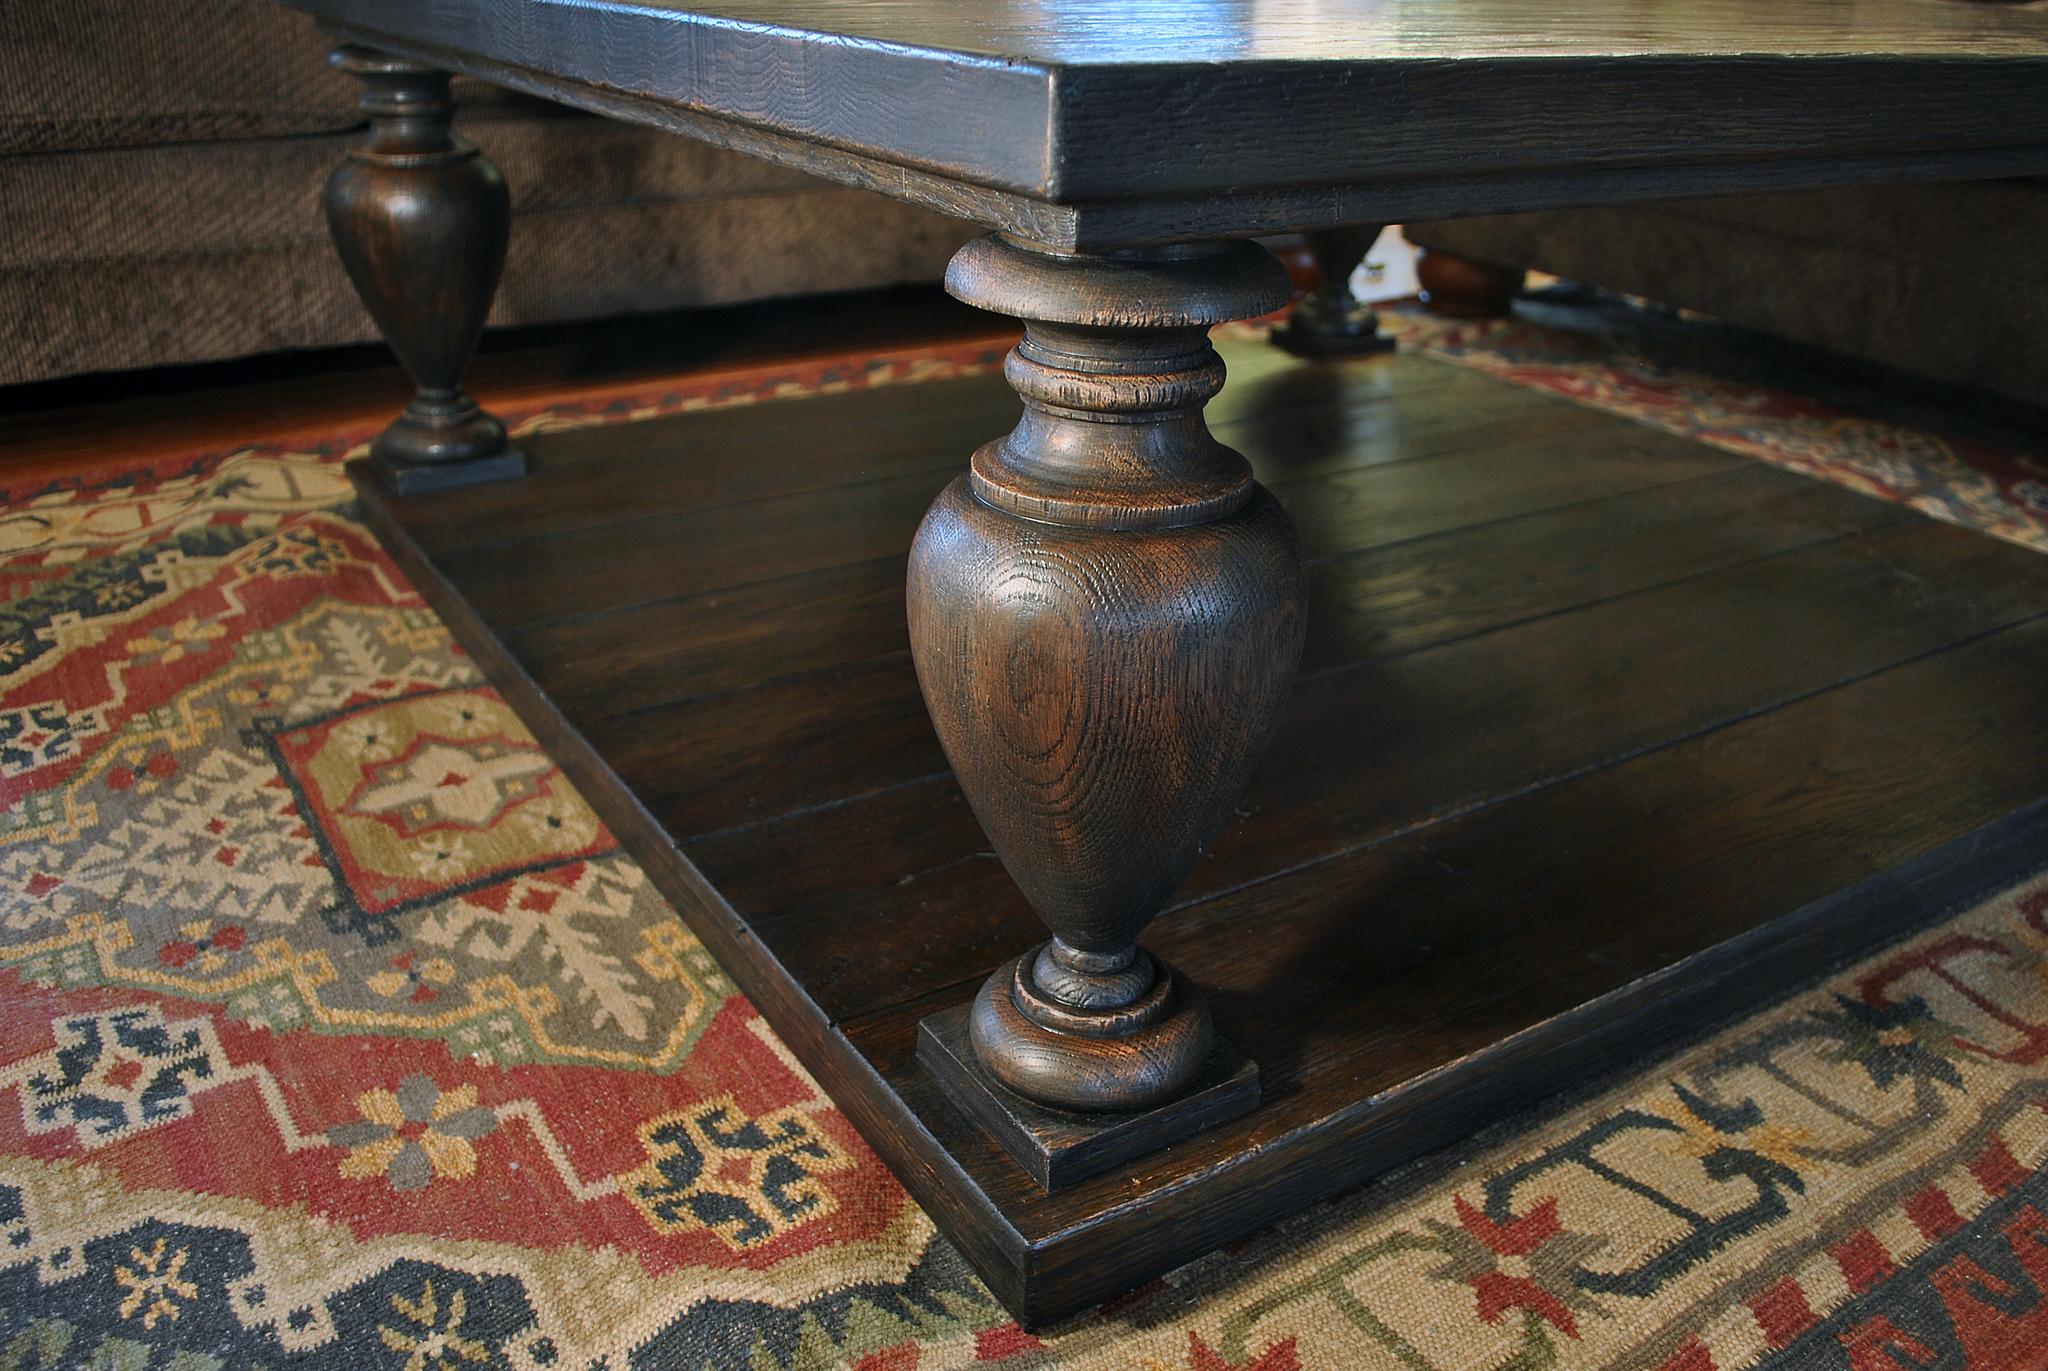 balluster-leg-coffee-table-design.jpg